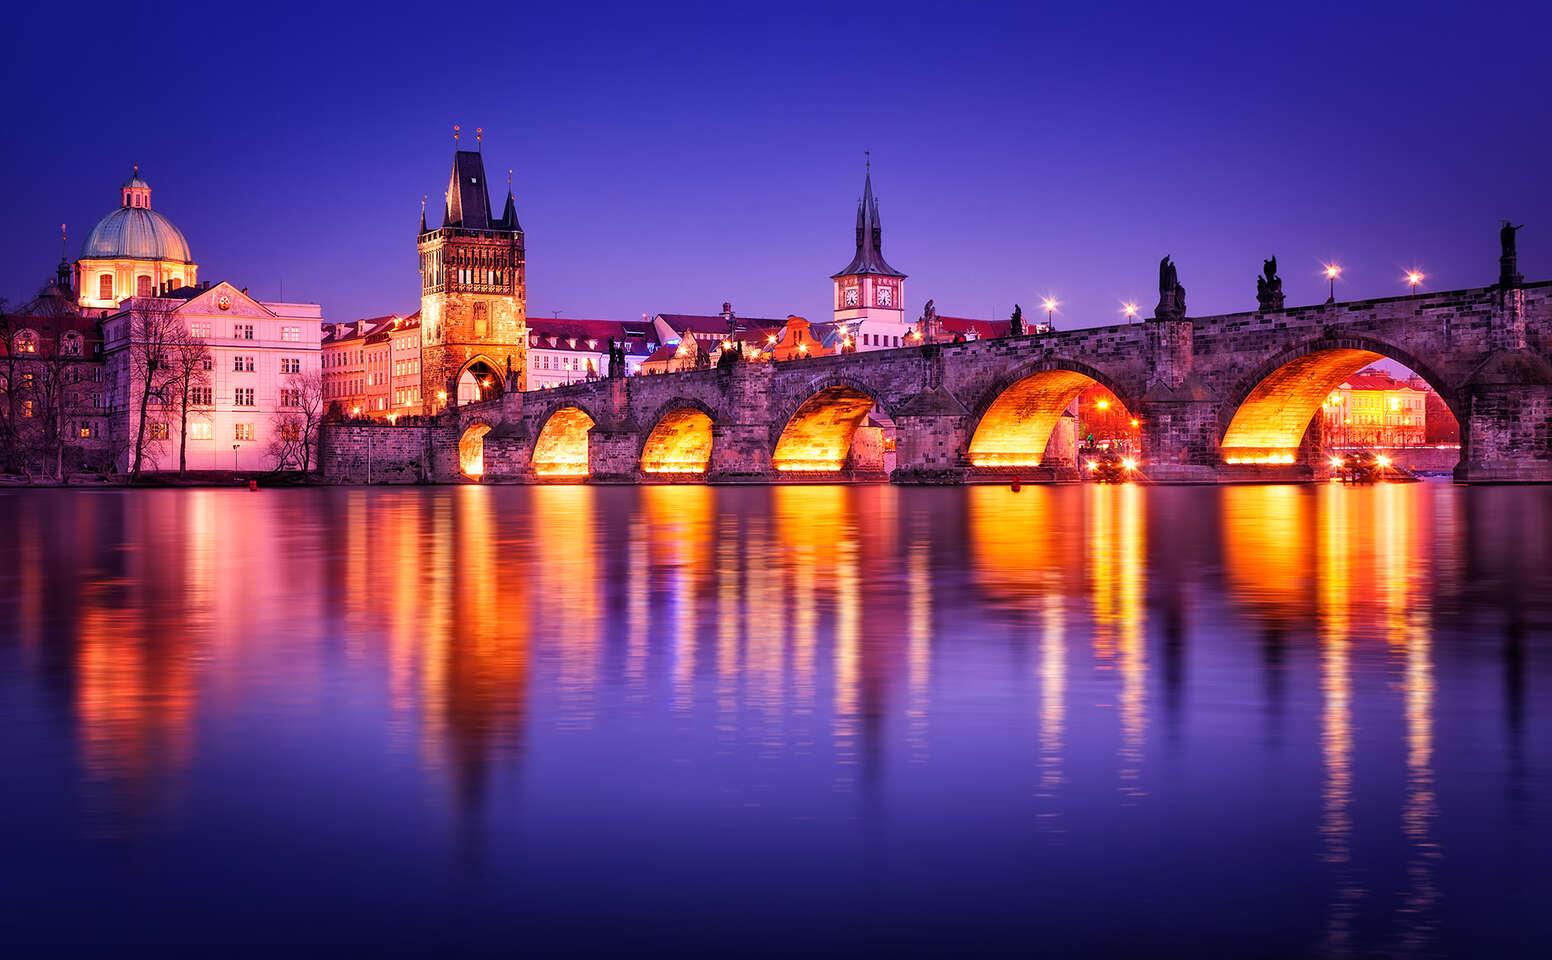 Pobyt v hoteli Don Giovanni**** len 10 min. od centra Prahy akýmkoľ...